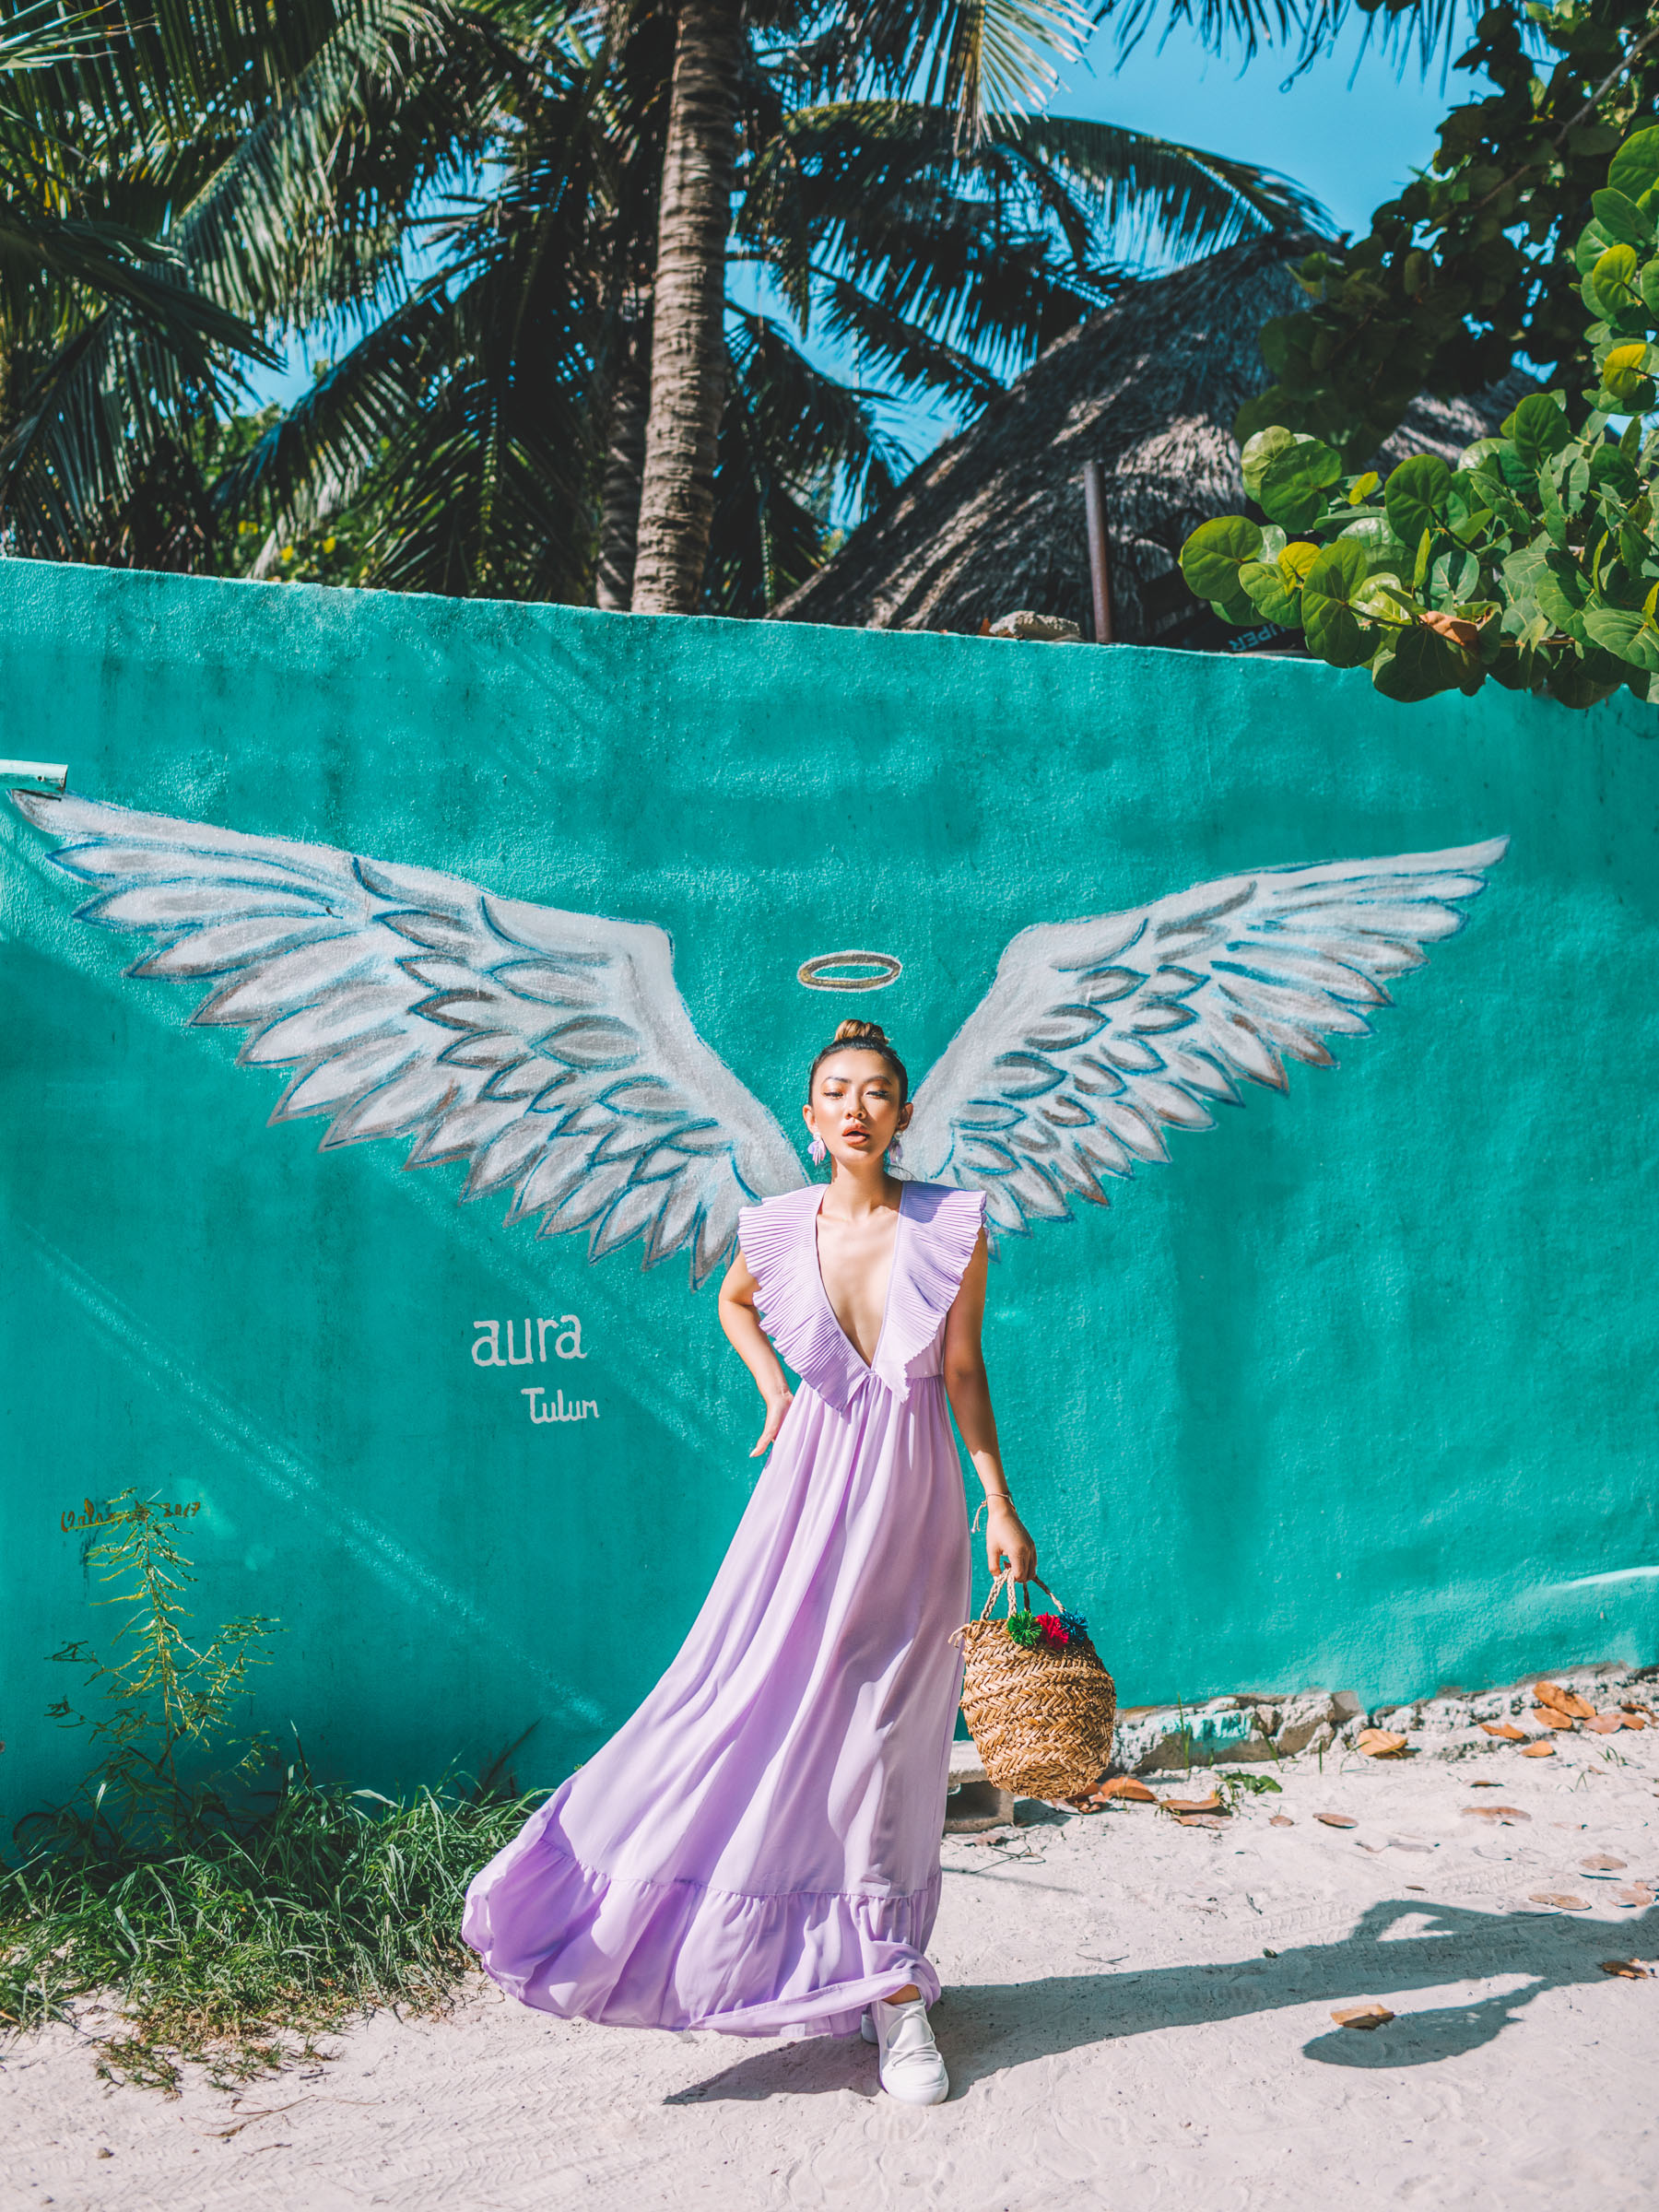 wear a bra without a dress, plunging neckline dress, cutout dress, tropical style, nastygal lavender dress // Notjessfashion.com